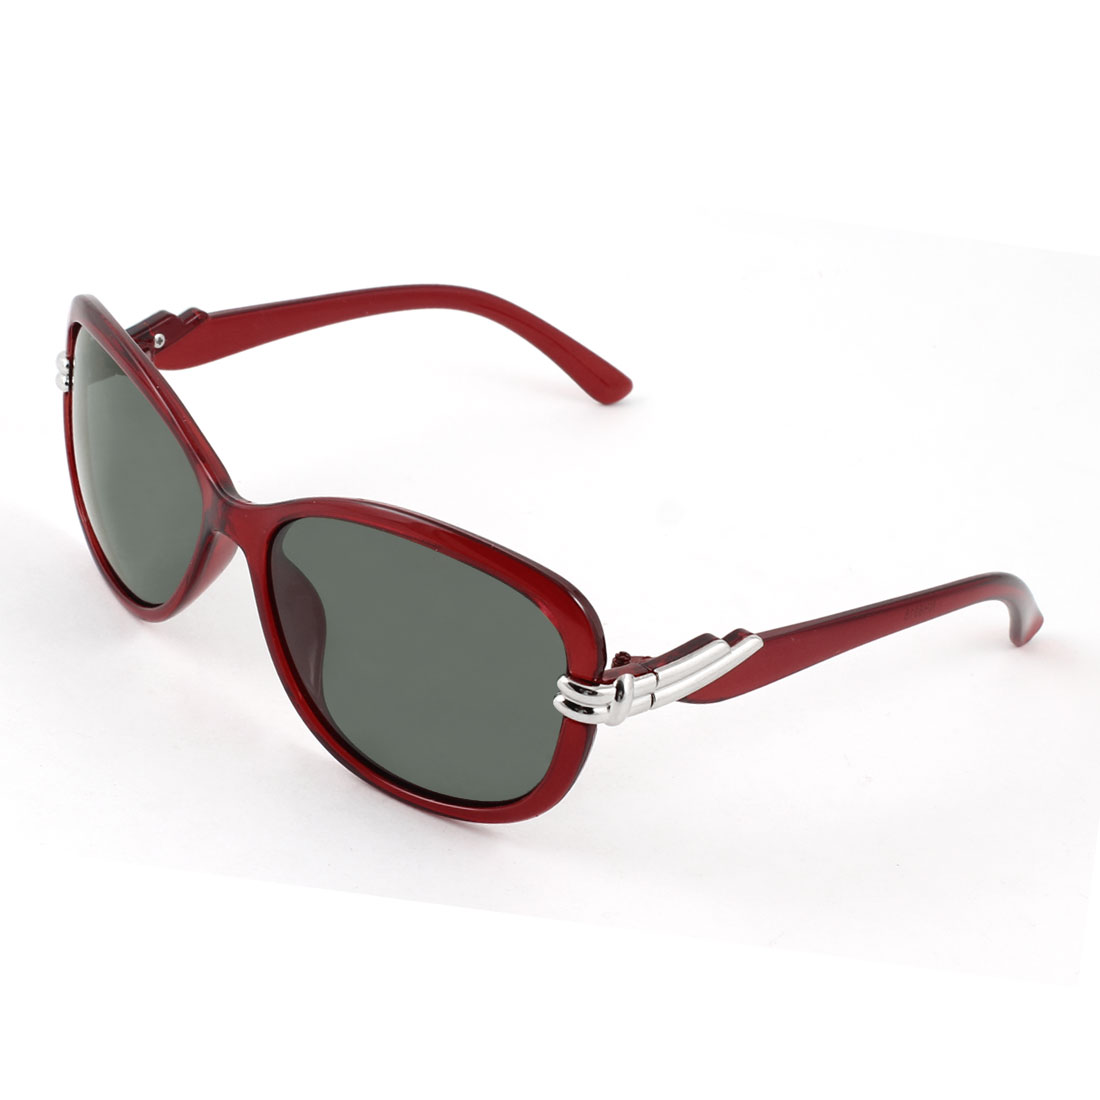 Burgundy Full Rim Gray Lens Driving Sports Polarized Sunglasses for Ladies